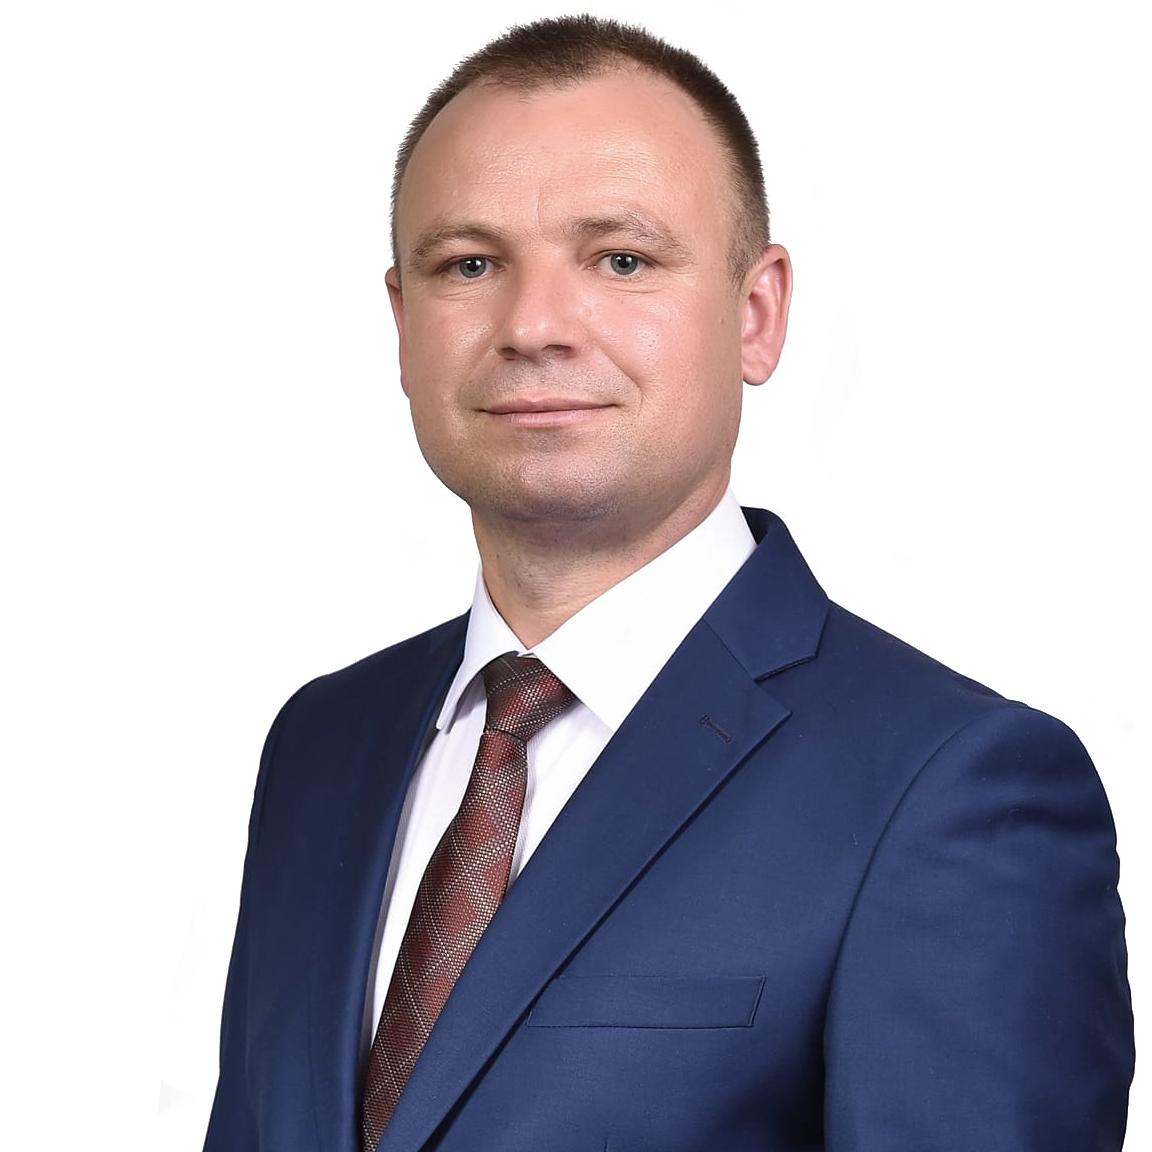 Dan-Constantin Hodoroabă